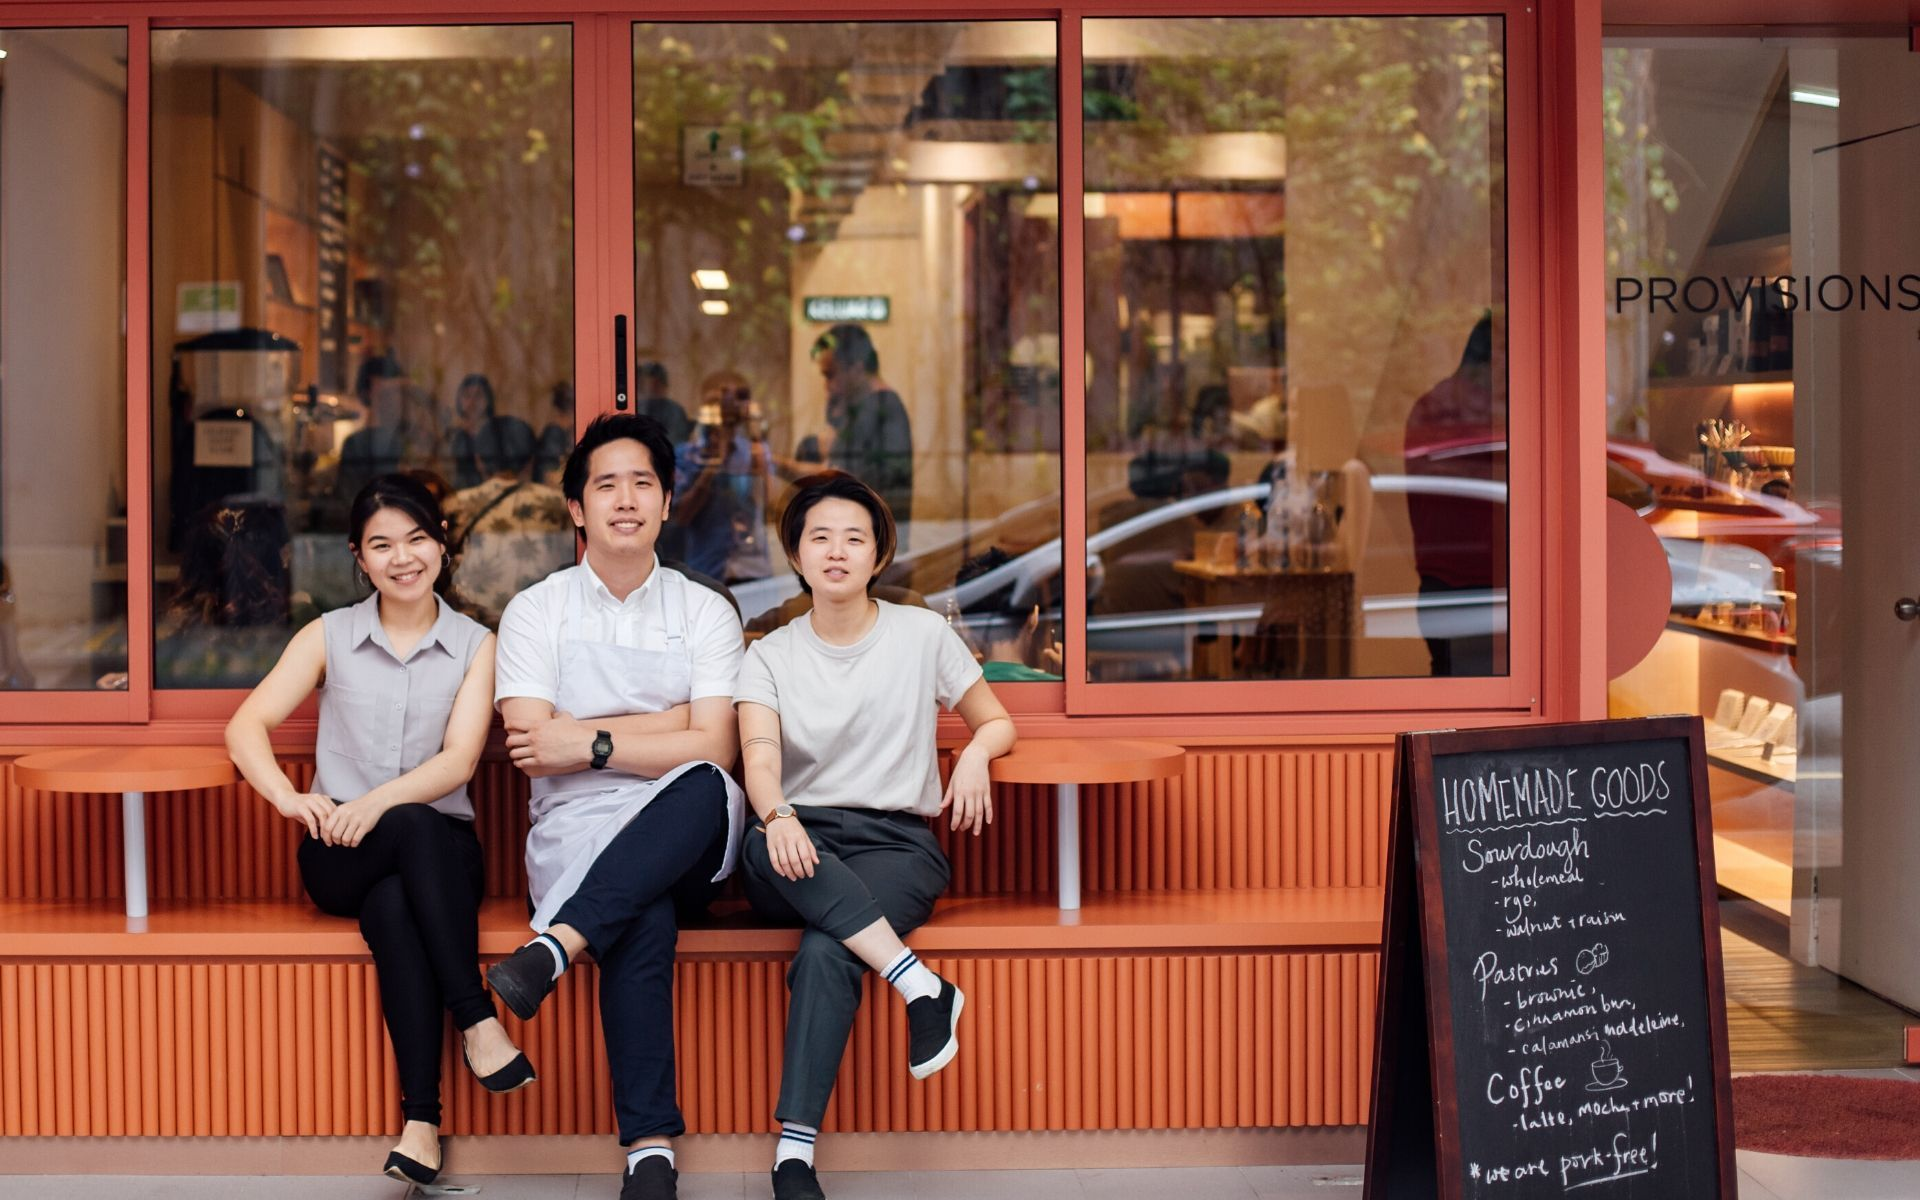 Quality Bread Beckons At Provisions Café By LI Damansara Jaya